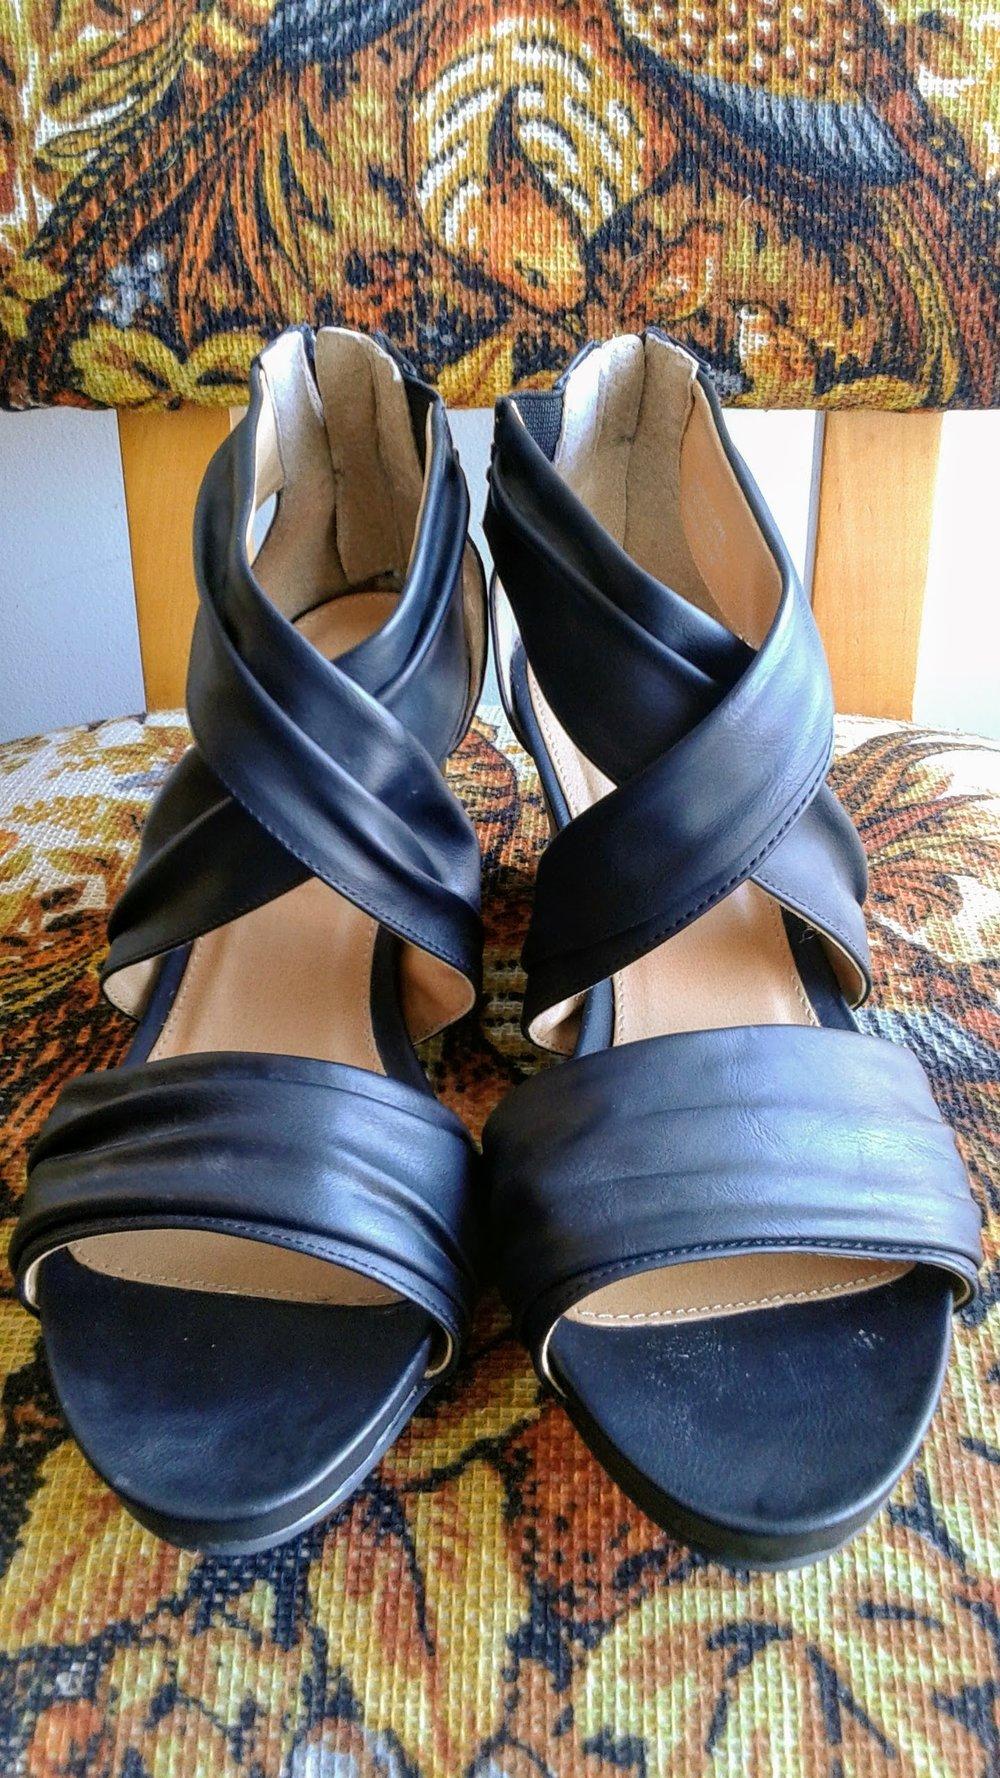 Steve Madden shoes; Size 9.5, $48